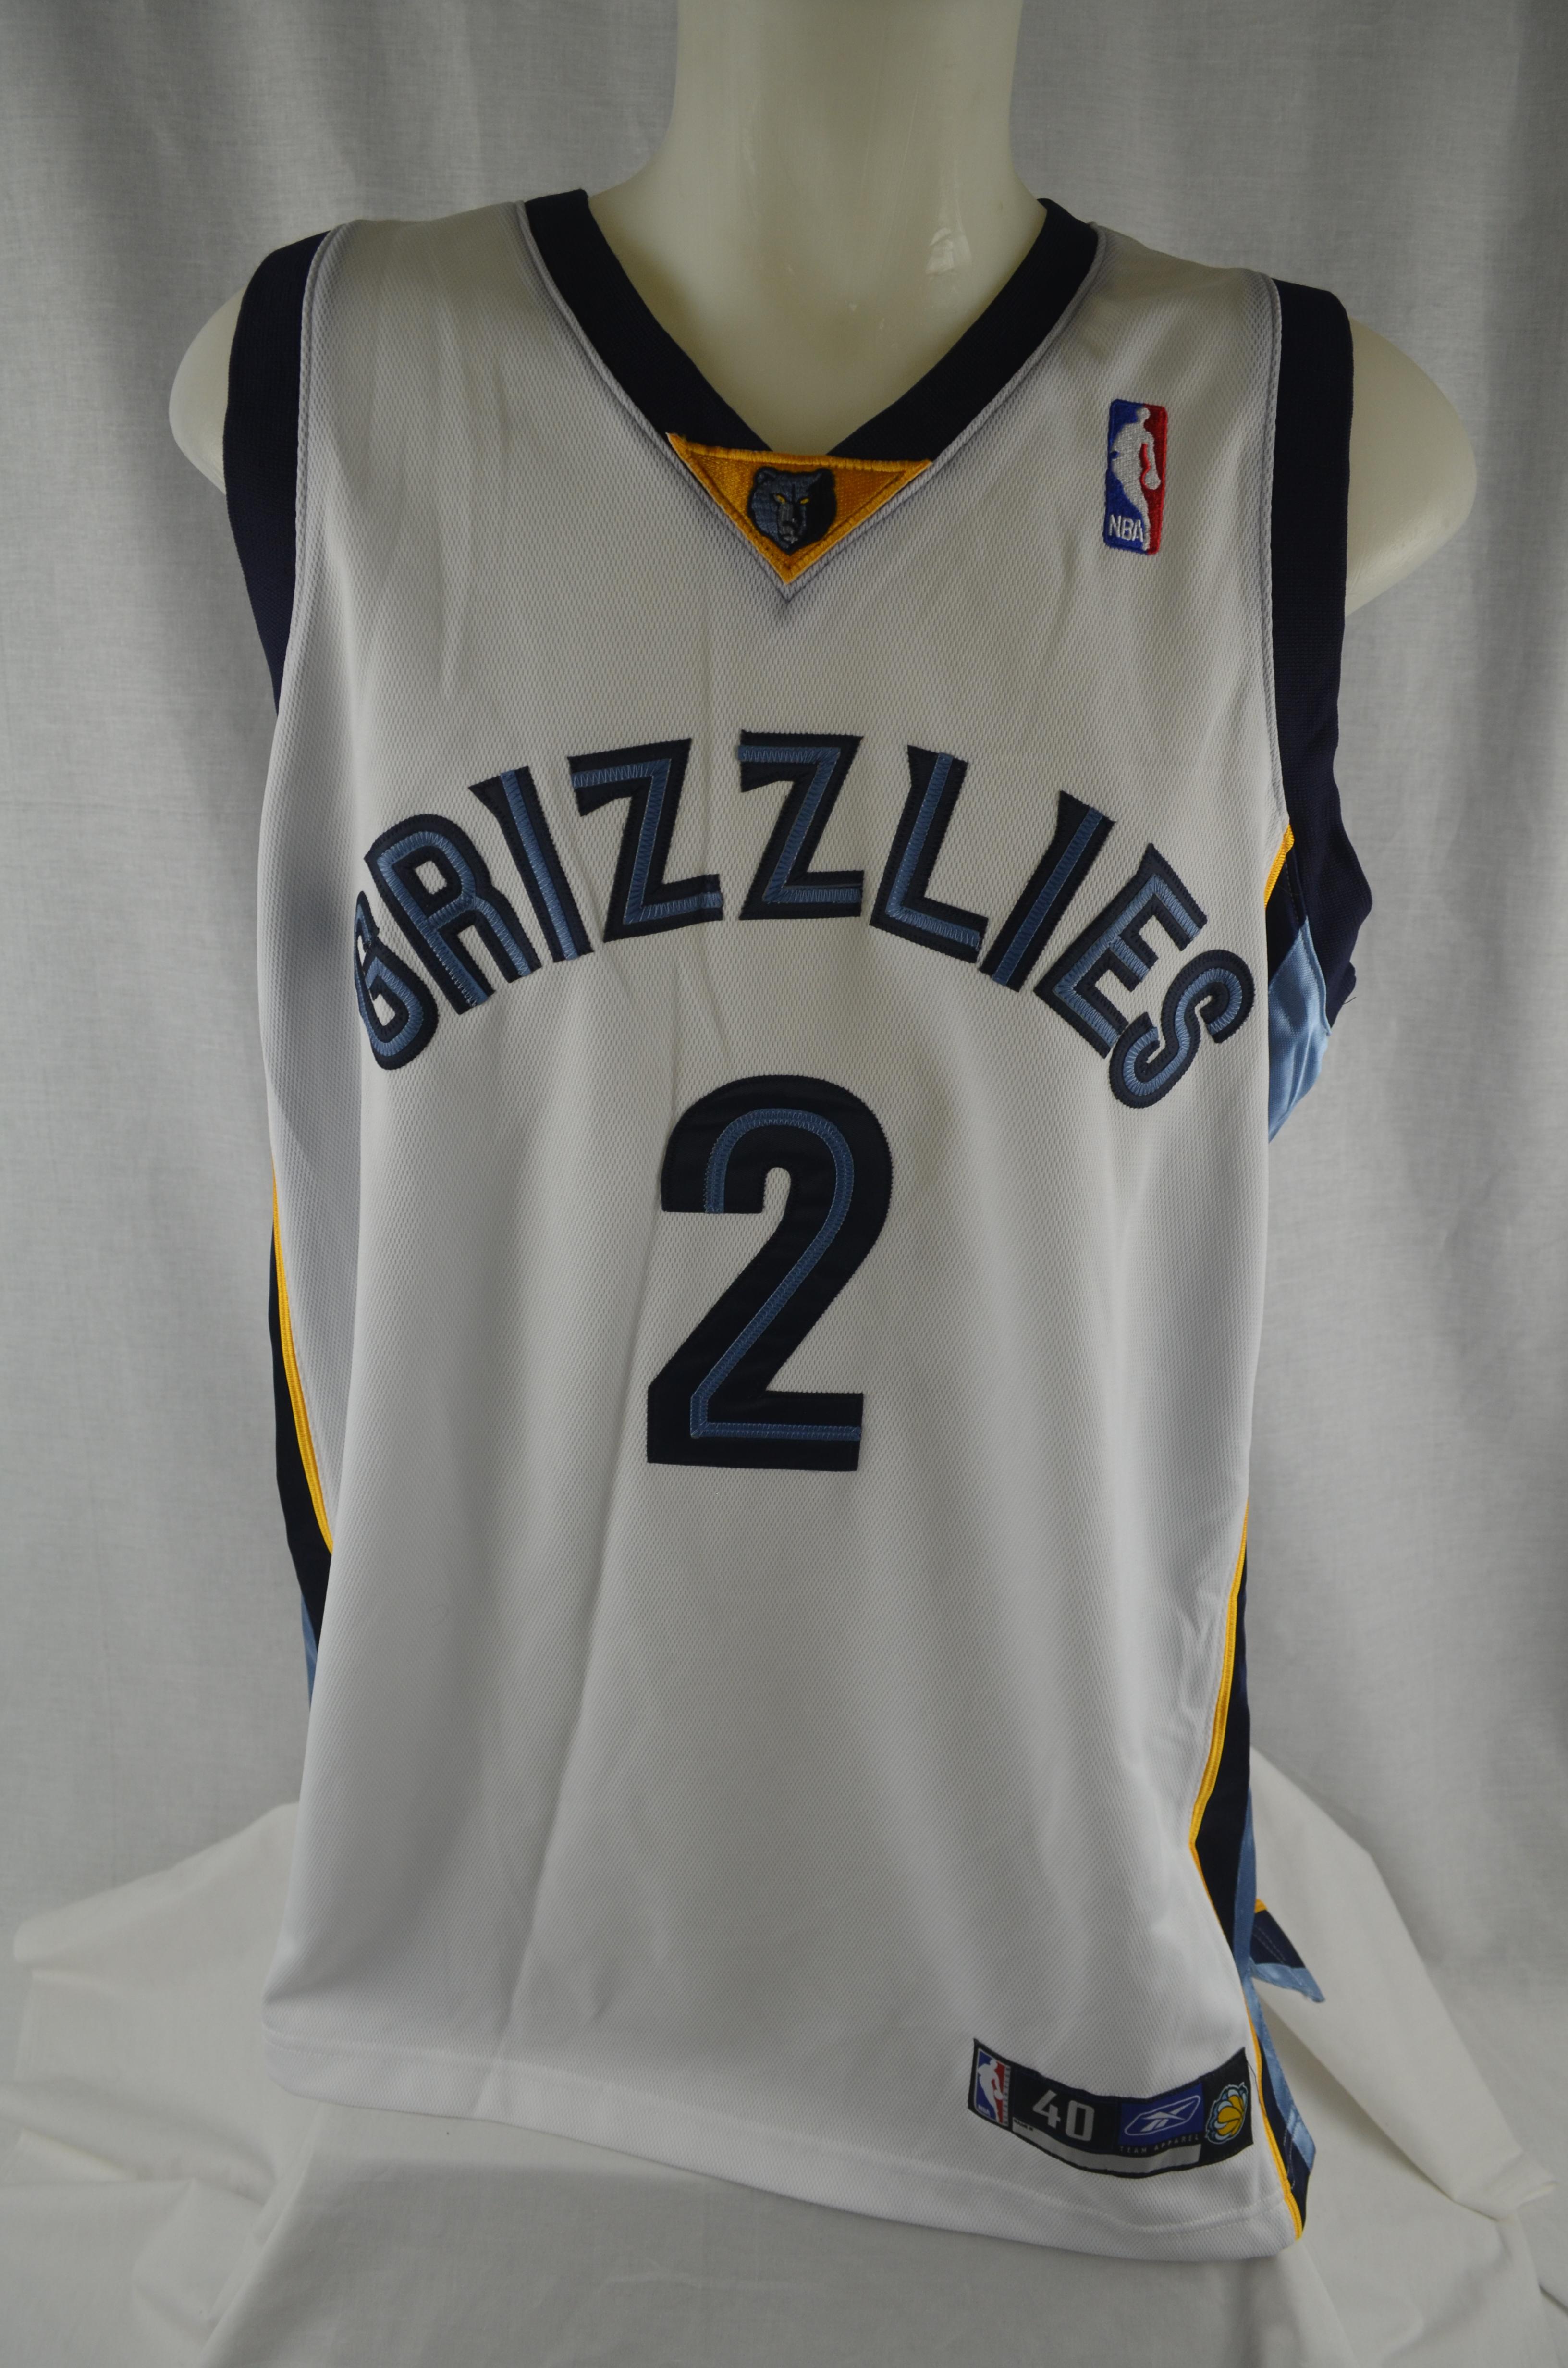 c1f6c5572 ... Jason Williams Memphis Grizzlies Authentic Reebok Basketball Jersey ...